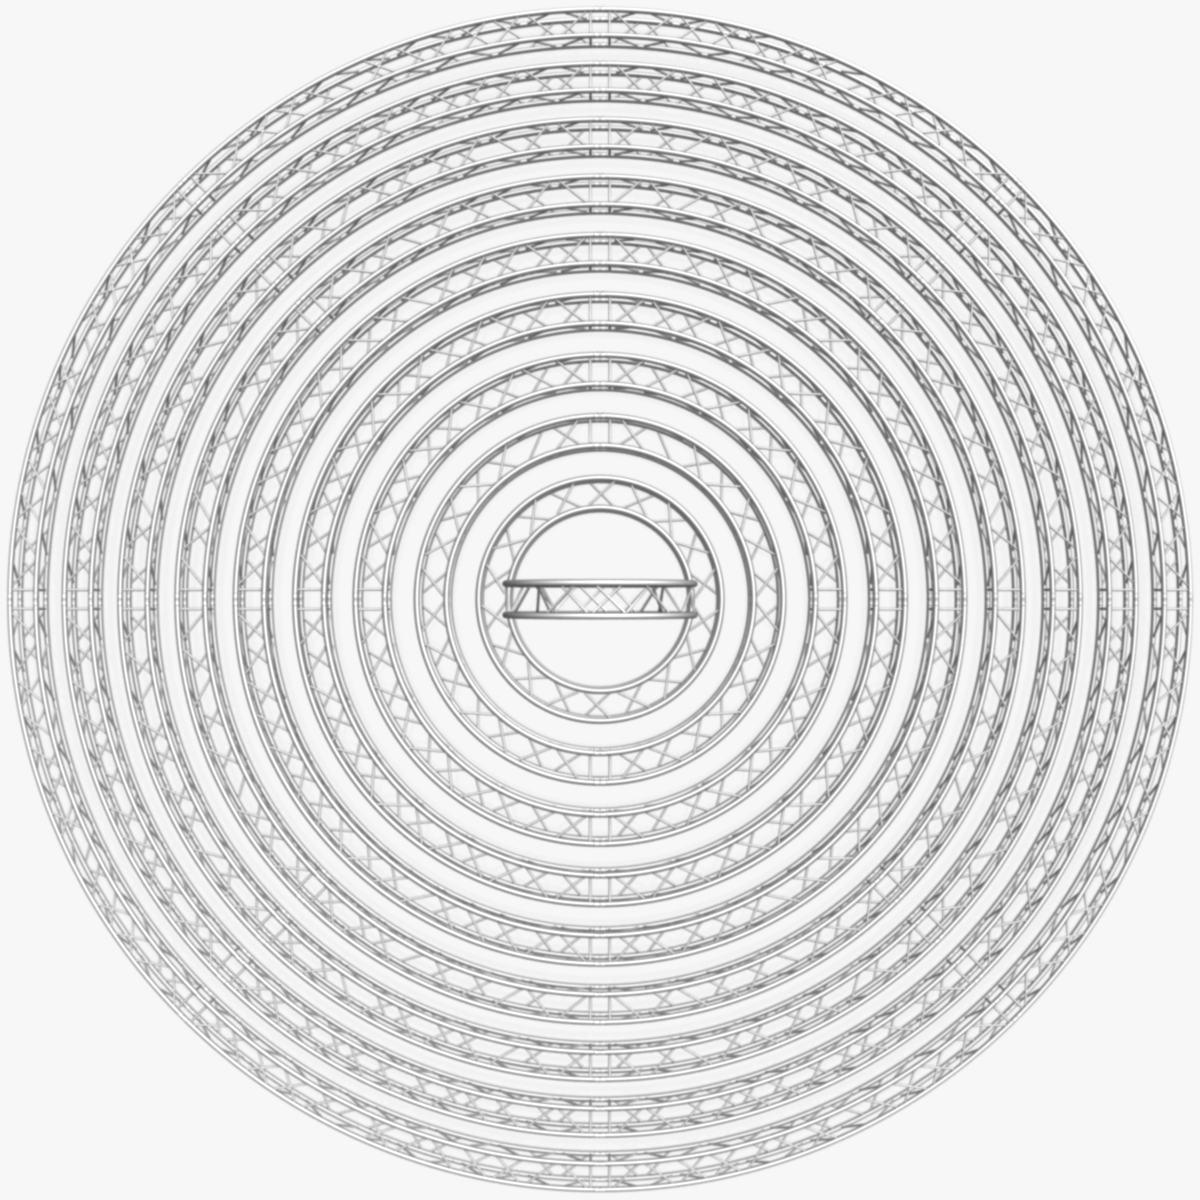 circle square truss modular collection 3d model 3ds max dxf fbx c4d dae  texture obj 252341